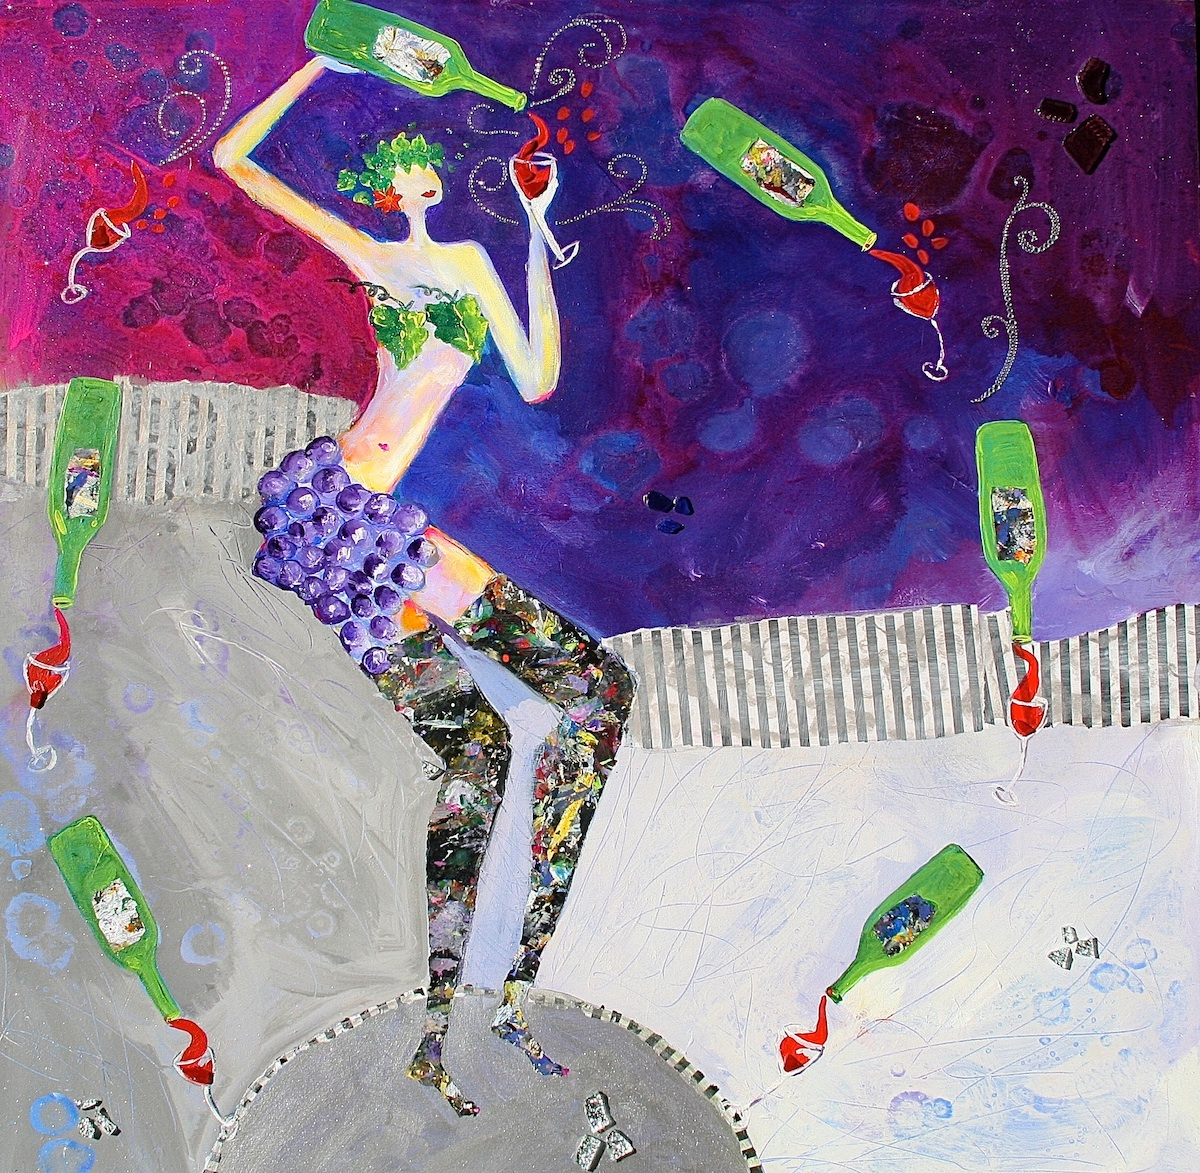 Goddess of Wine - Painting by Stephanie Schlatter